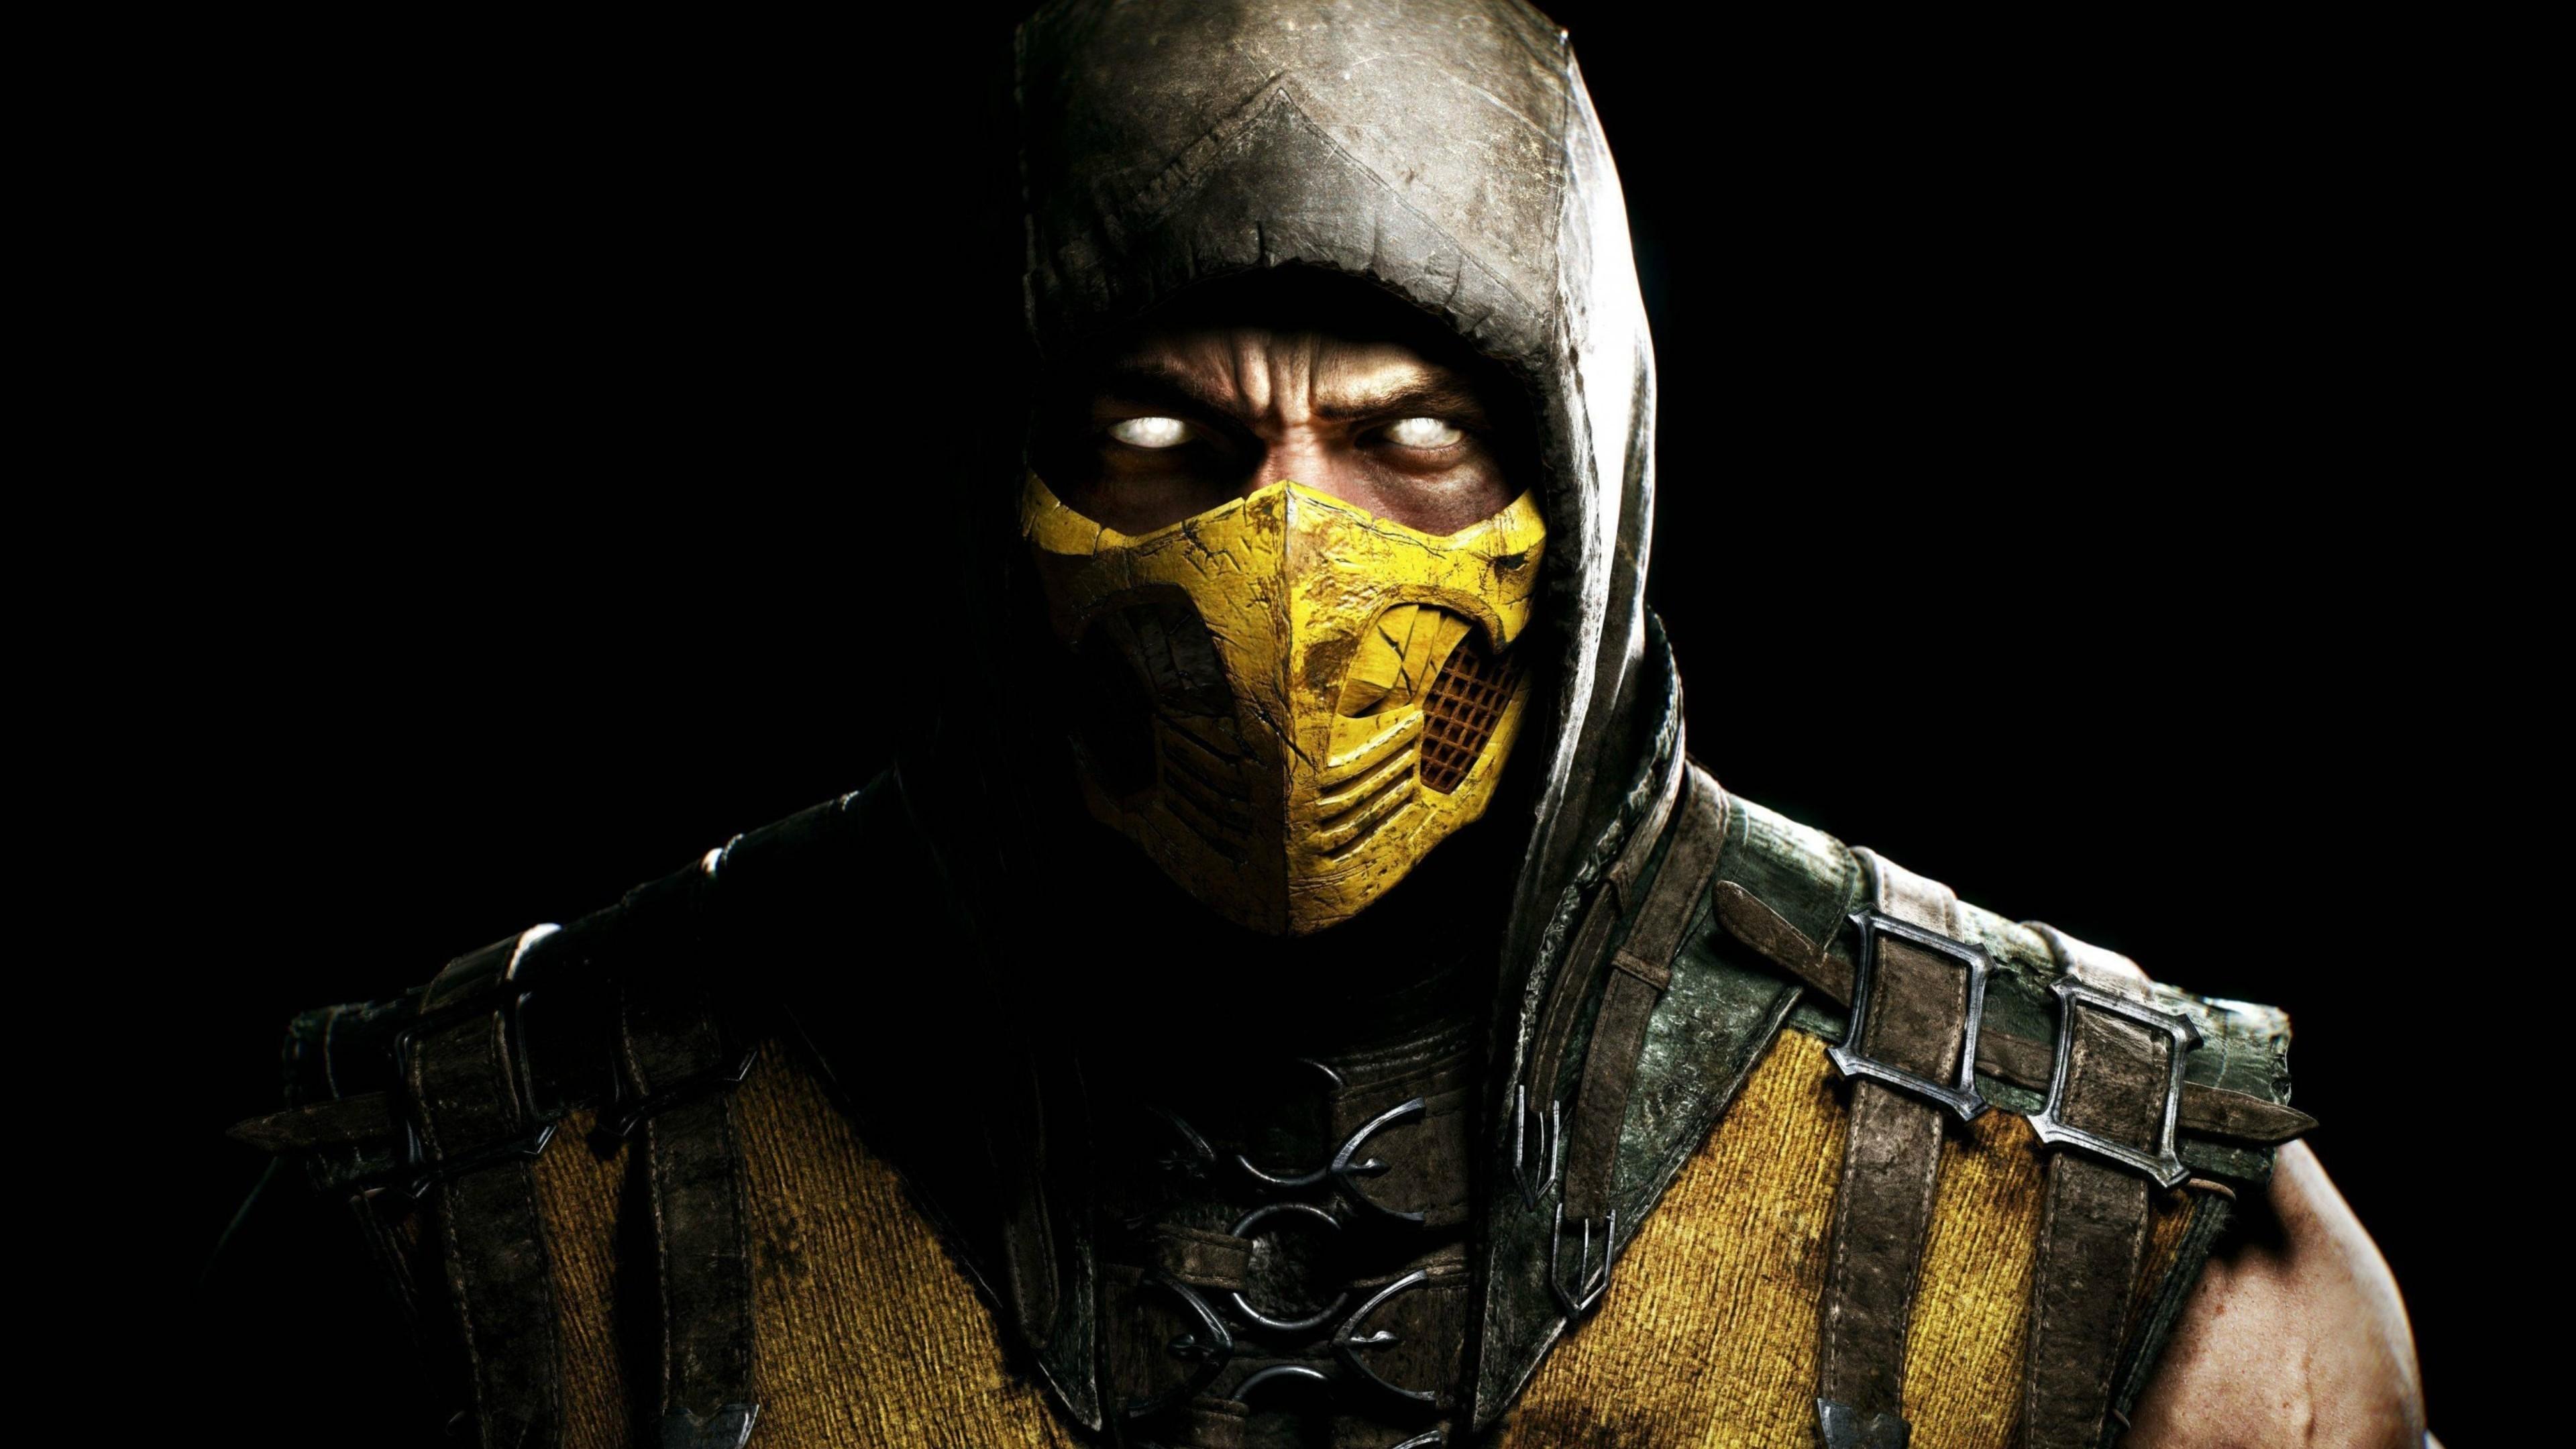 Res: 3840x2160, Scorpion In Mortal Kombat (2048x1152 Resolution)